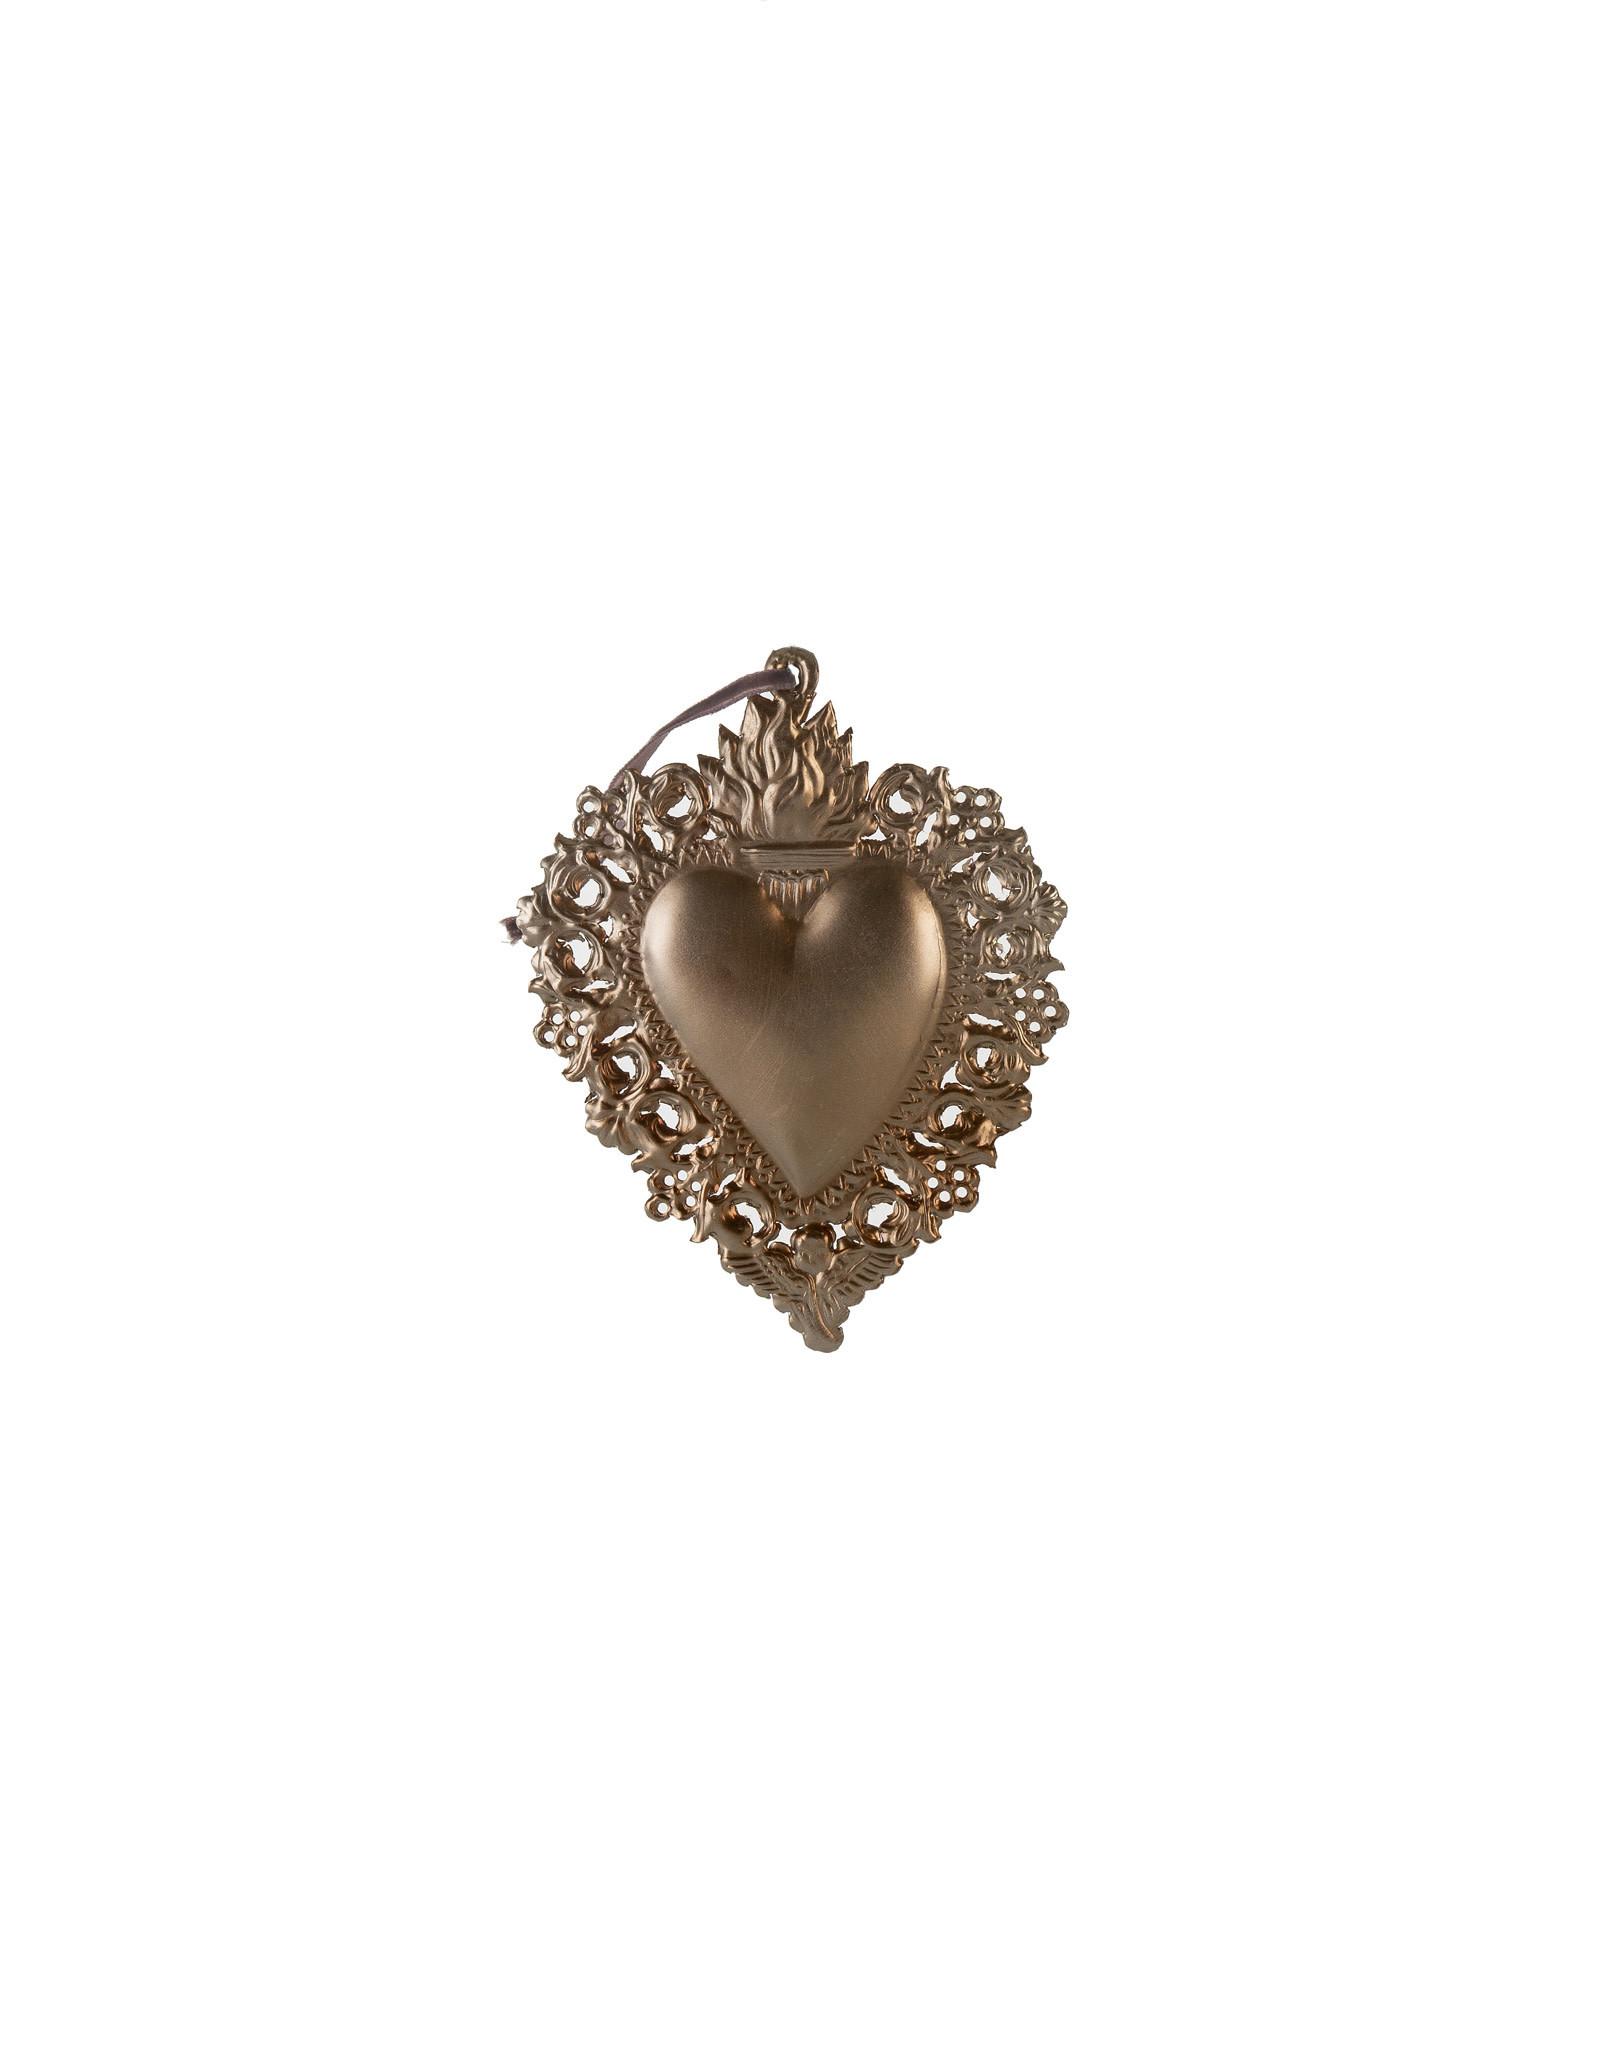 Indaba Small Milagro Heart Ornament